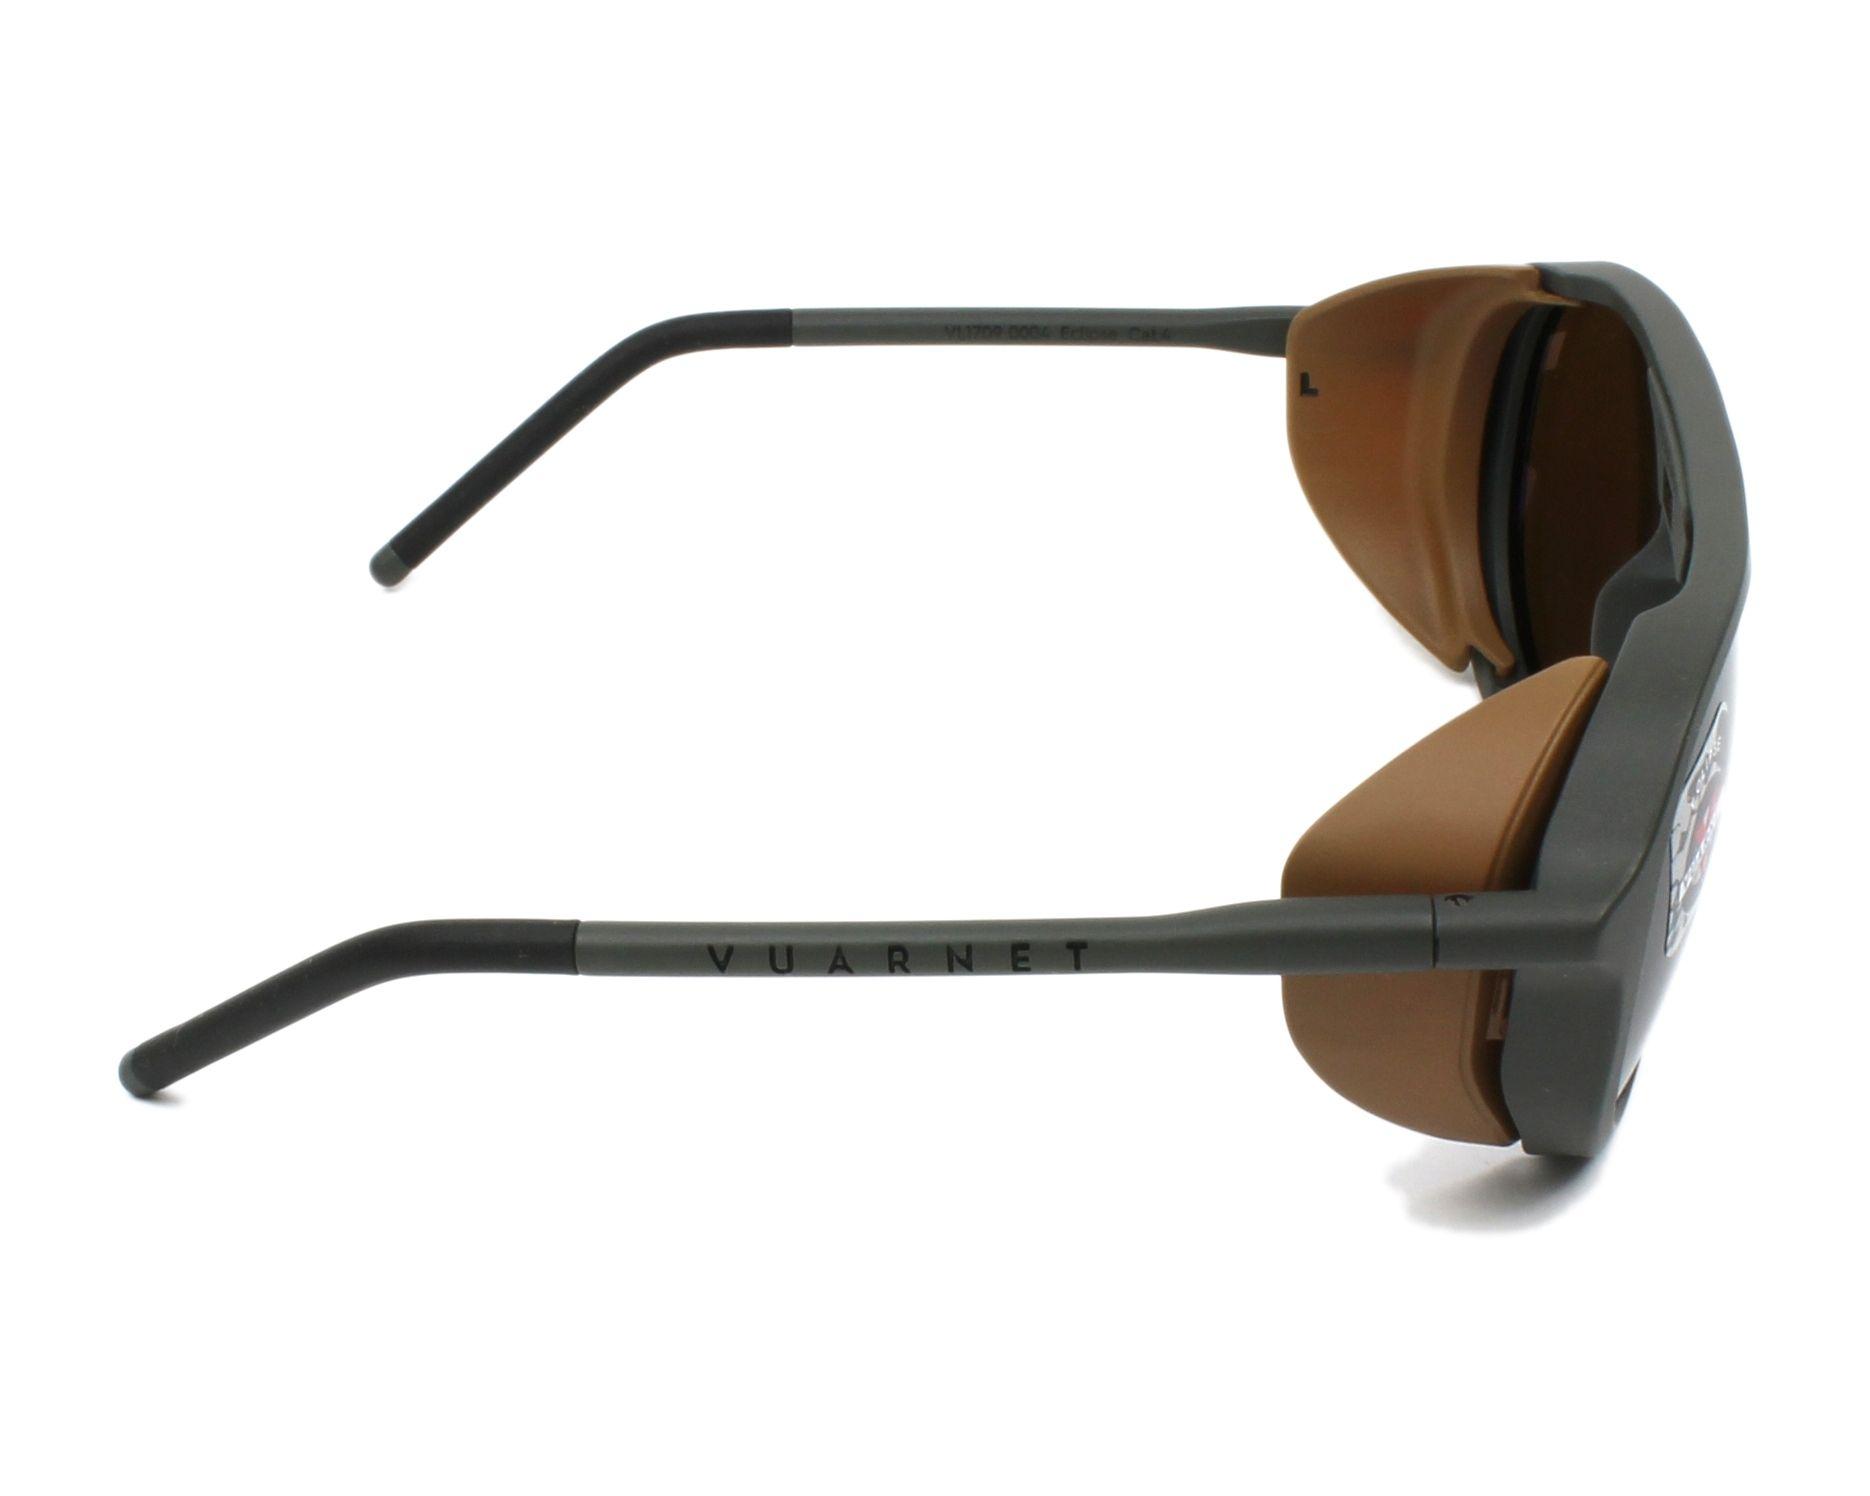 80dafa73c96 thumbnail Sunglasses Vuarnet VL-1709 0004-2182 51-18 Green side view